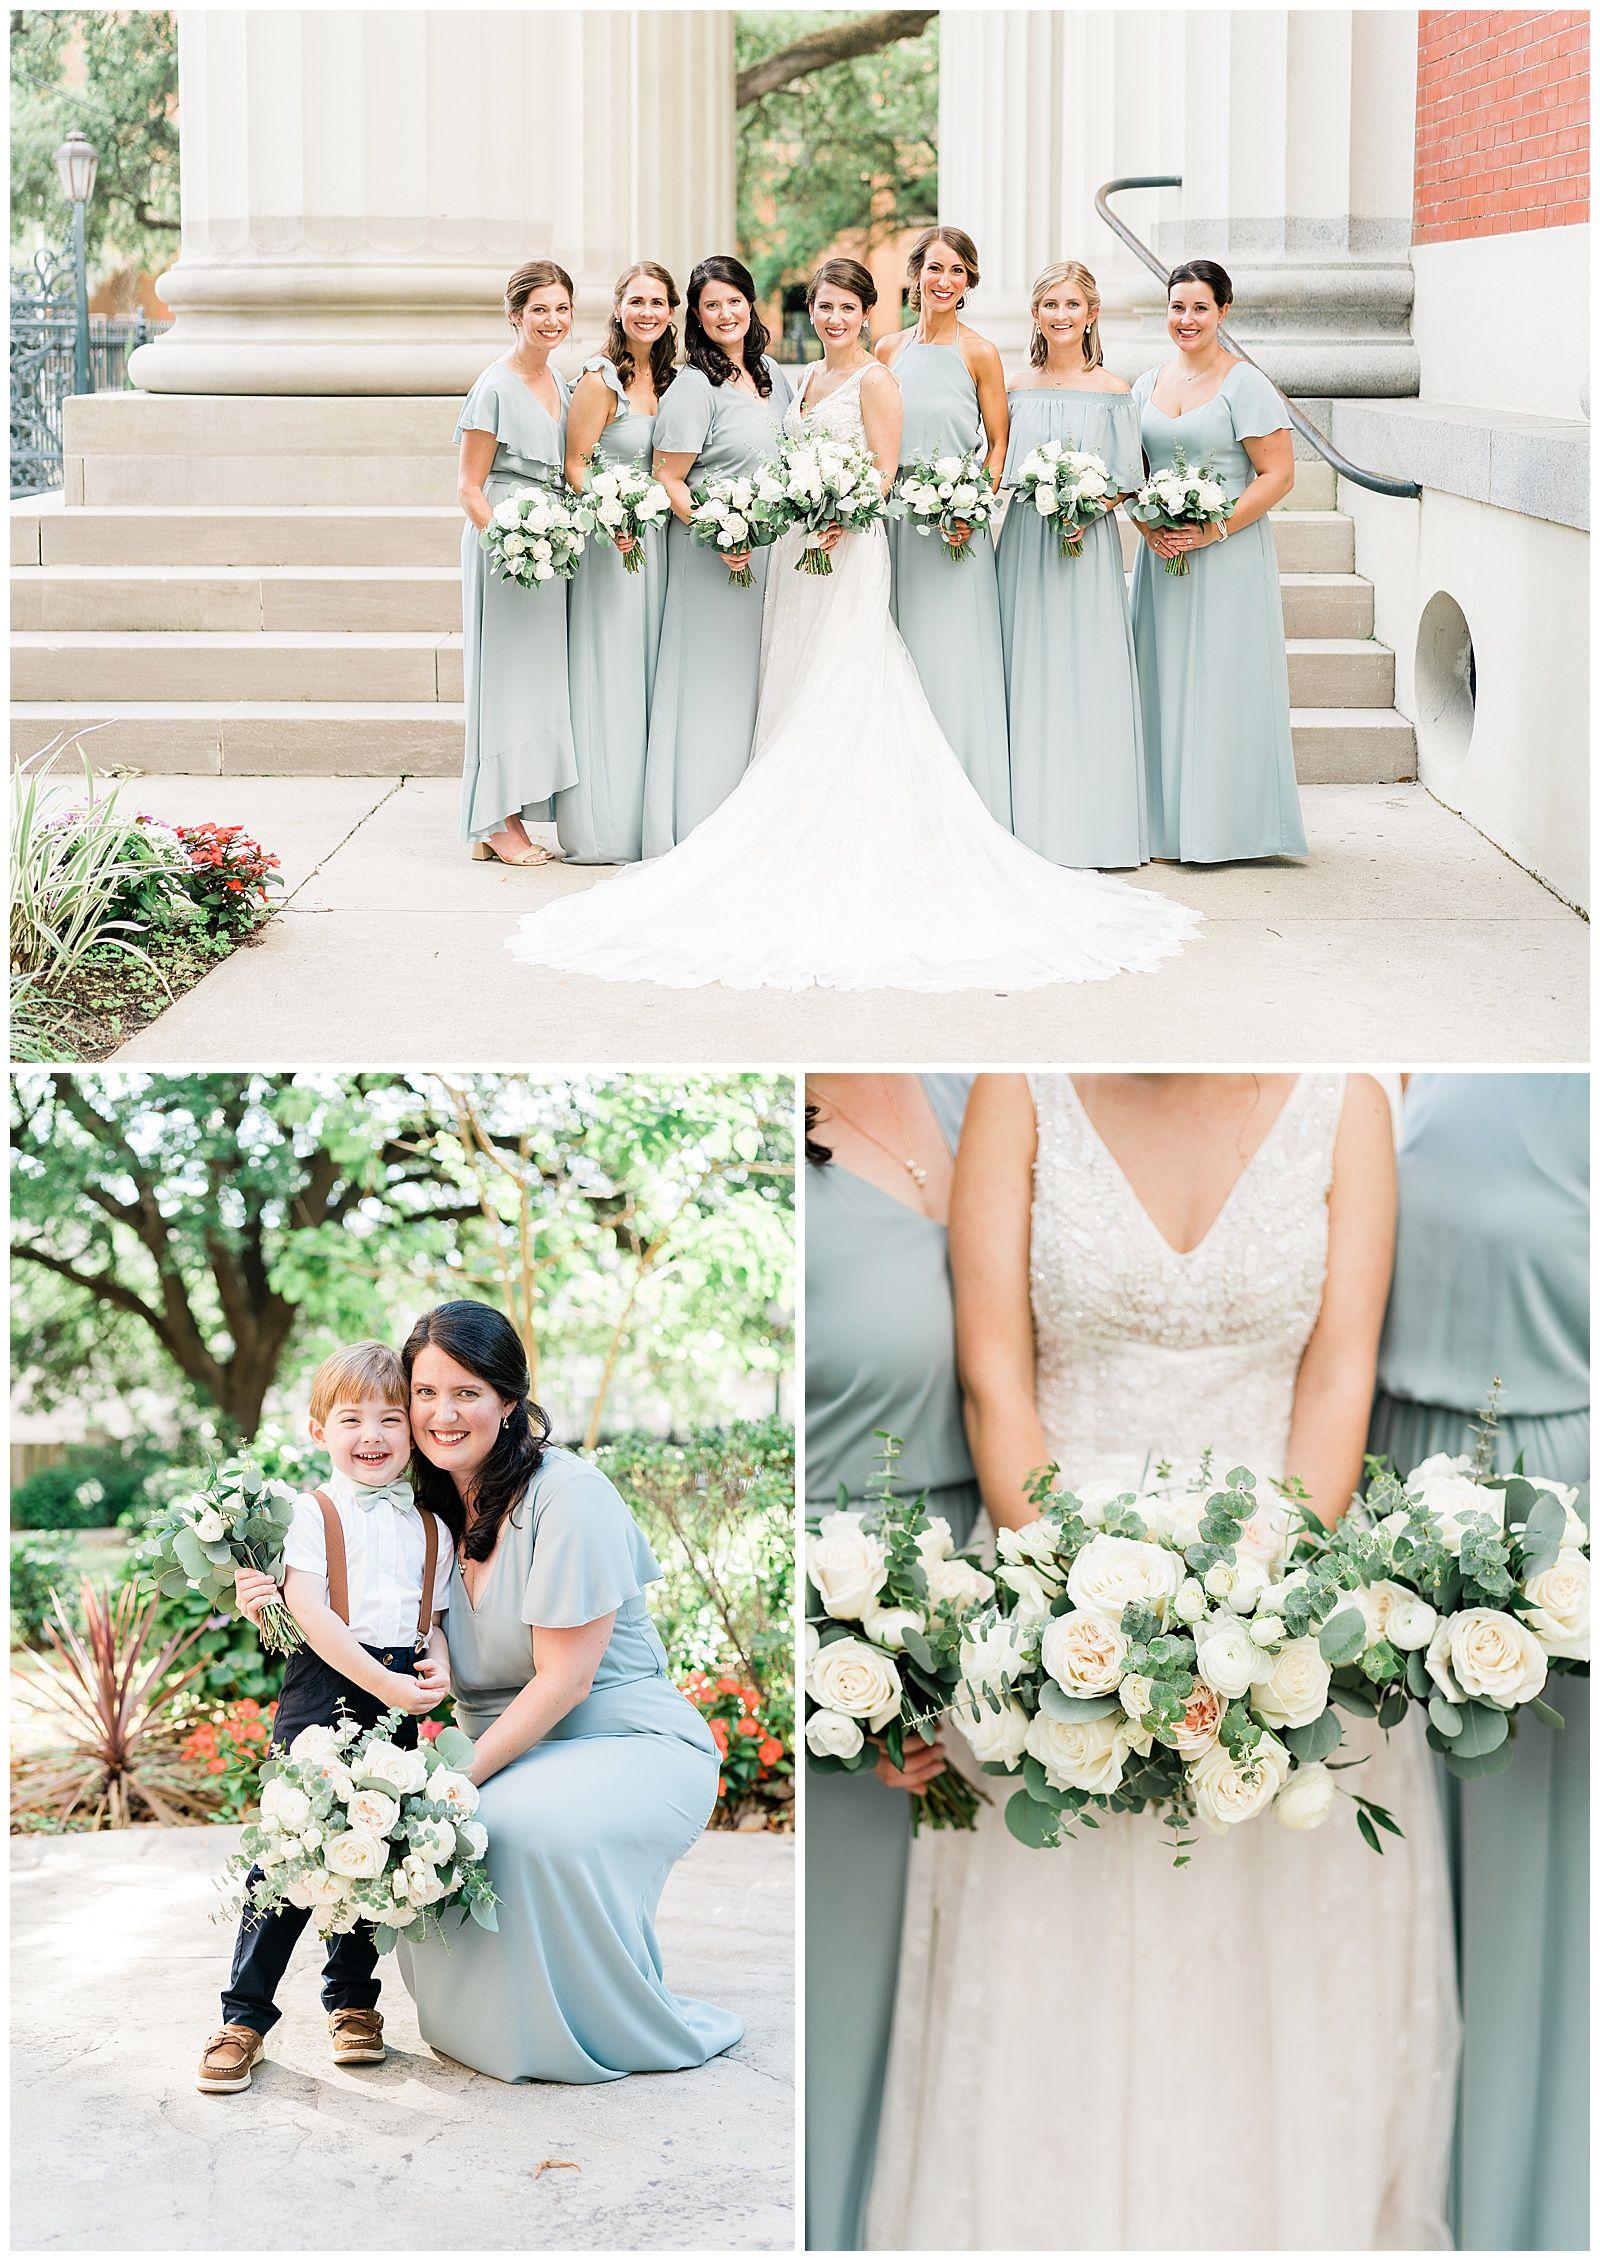 Wedding Details In 2020 Alabama Wedding Venues Wedding Alabama Weddings